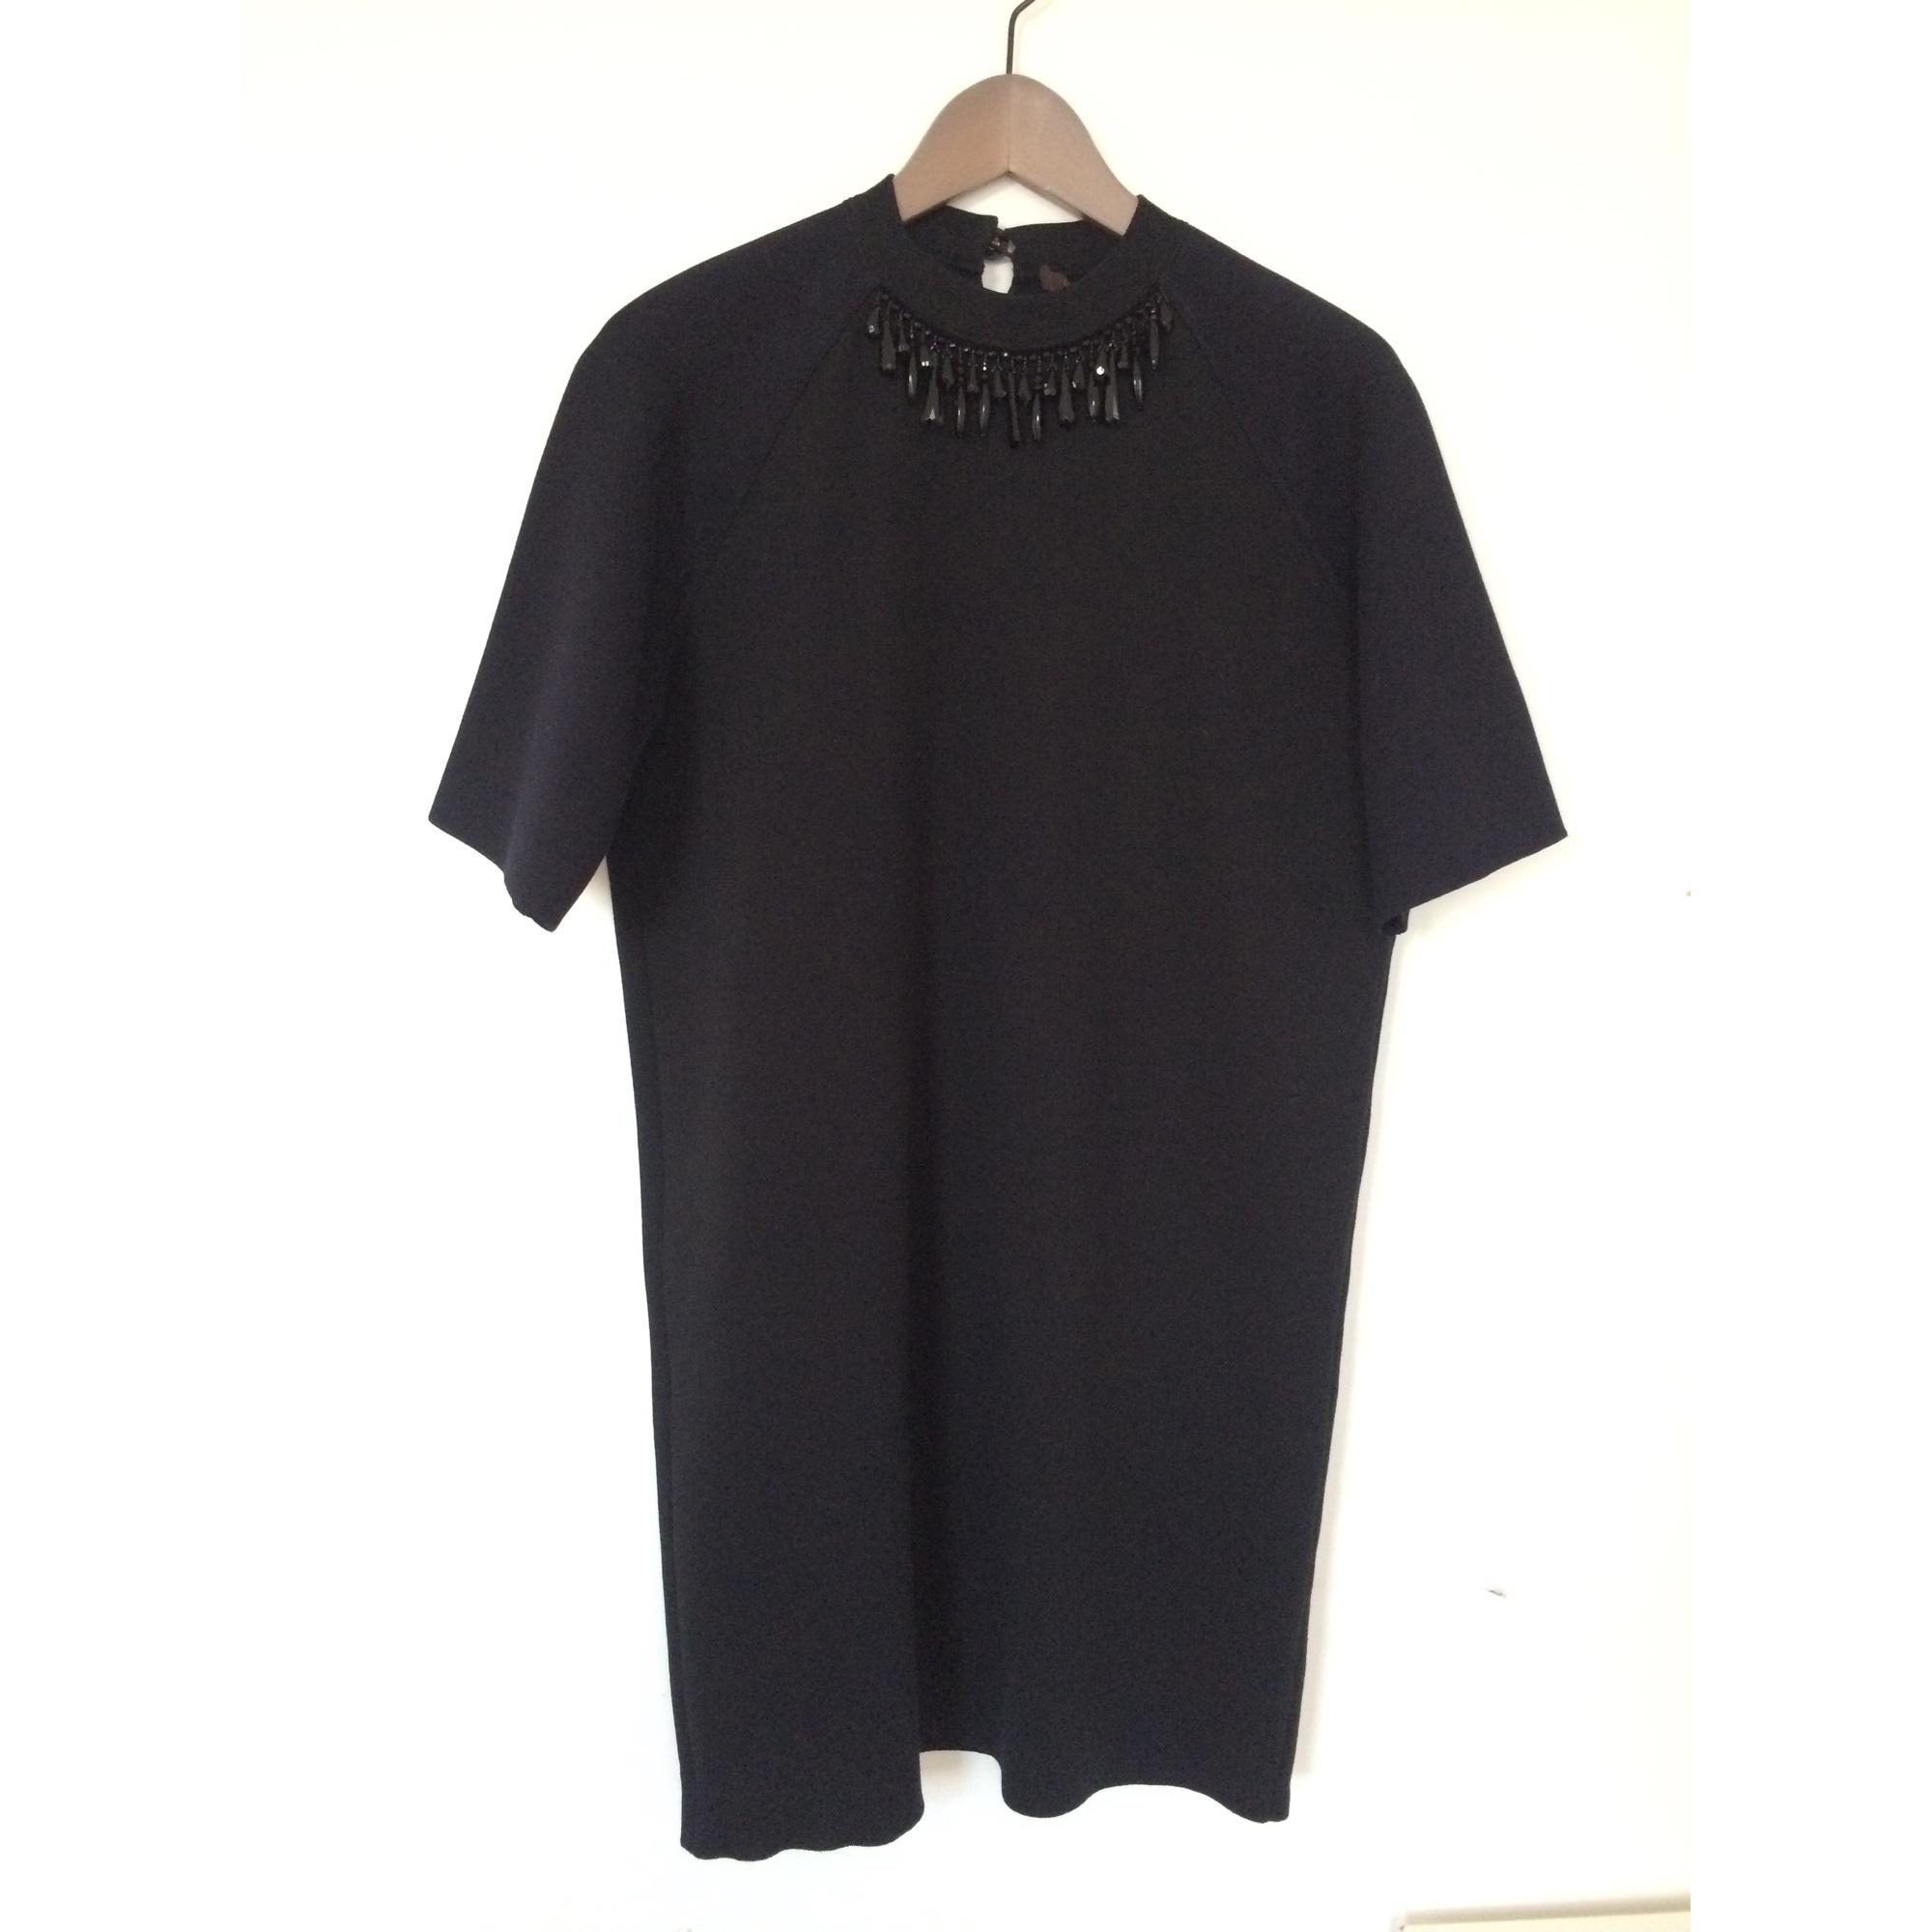 Robe tunique LOUIS VUITTON Noir/bleu